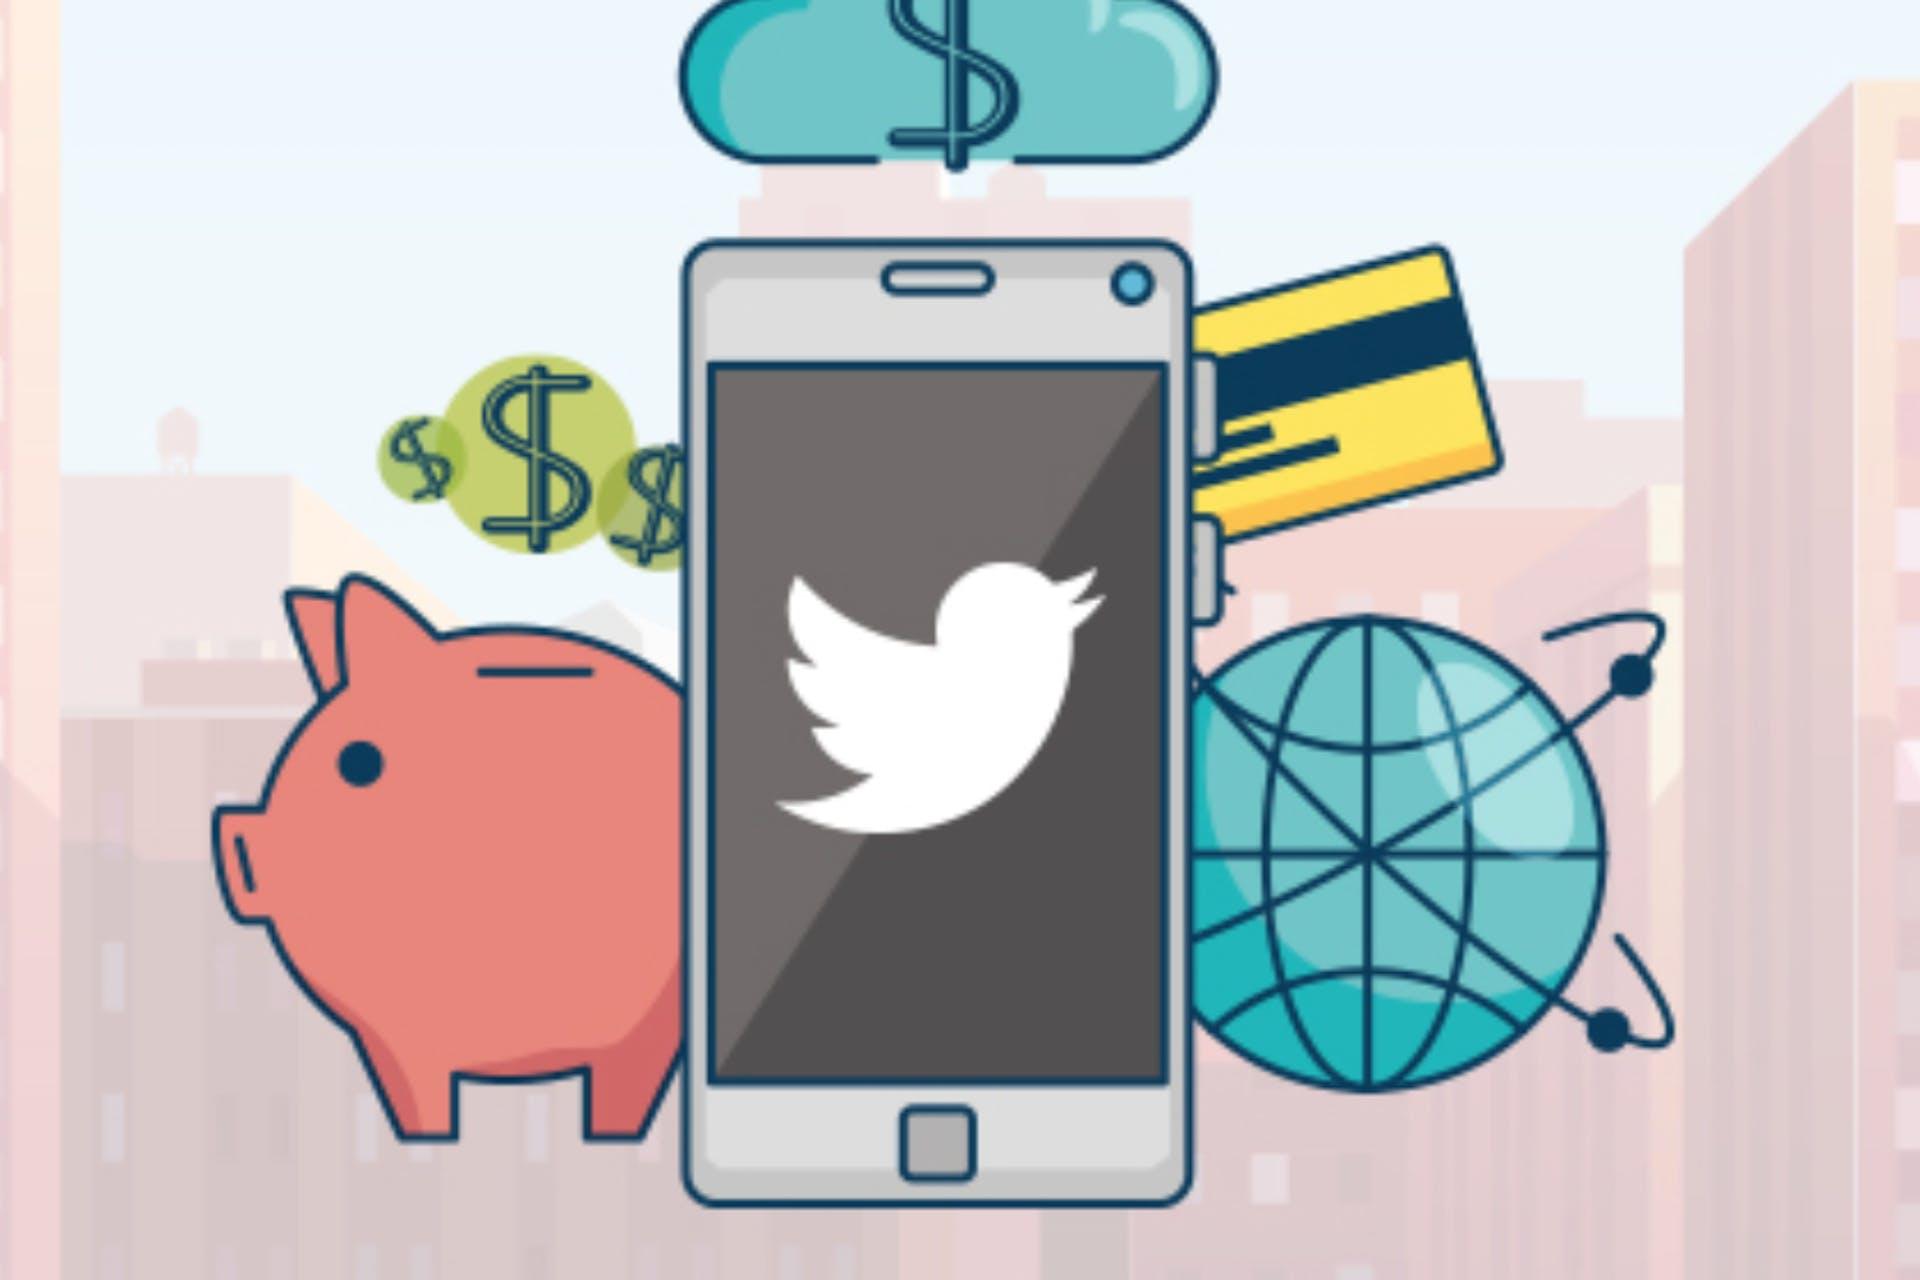 Fintech companies twitter illustration